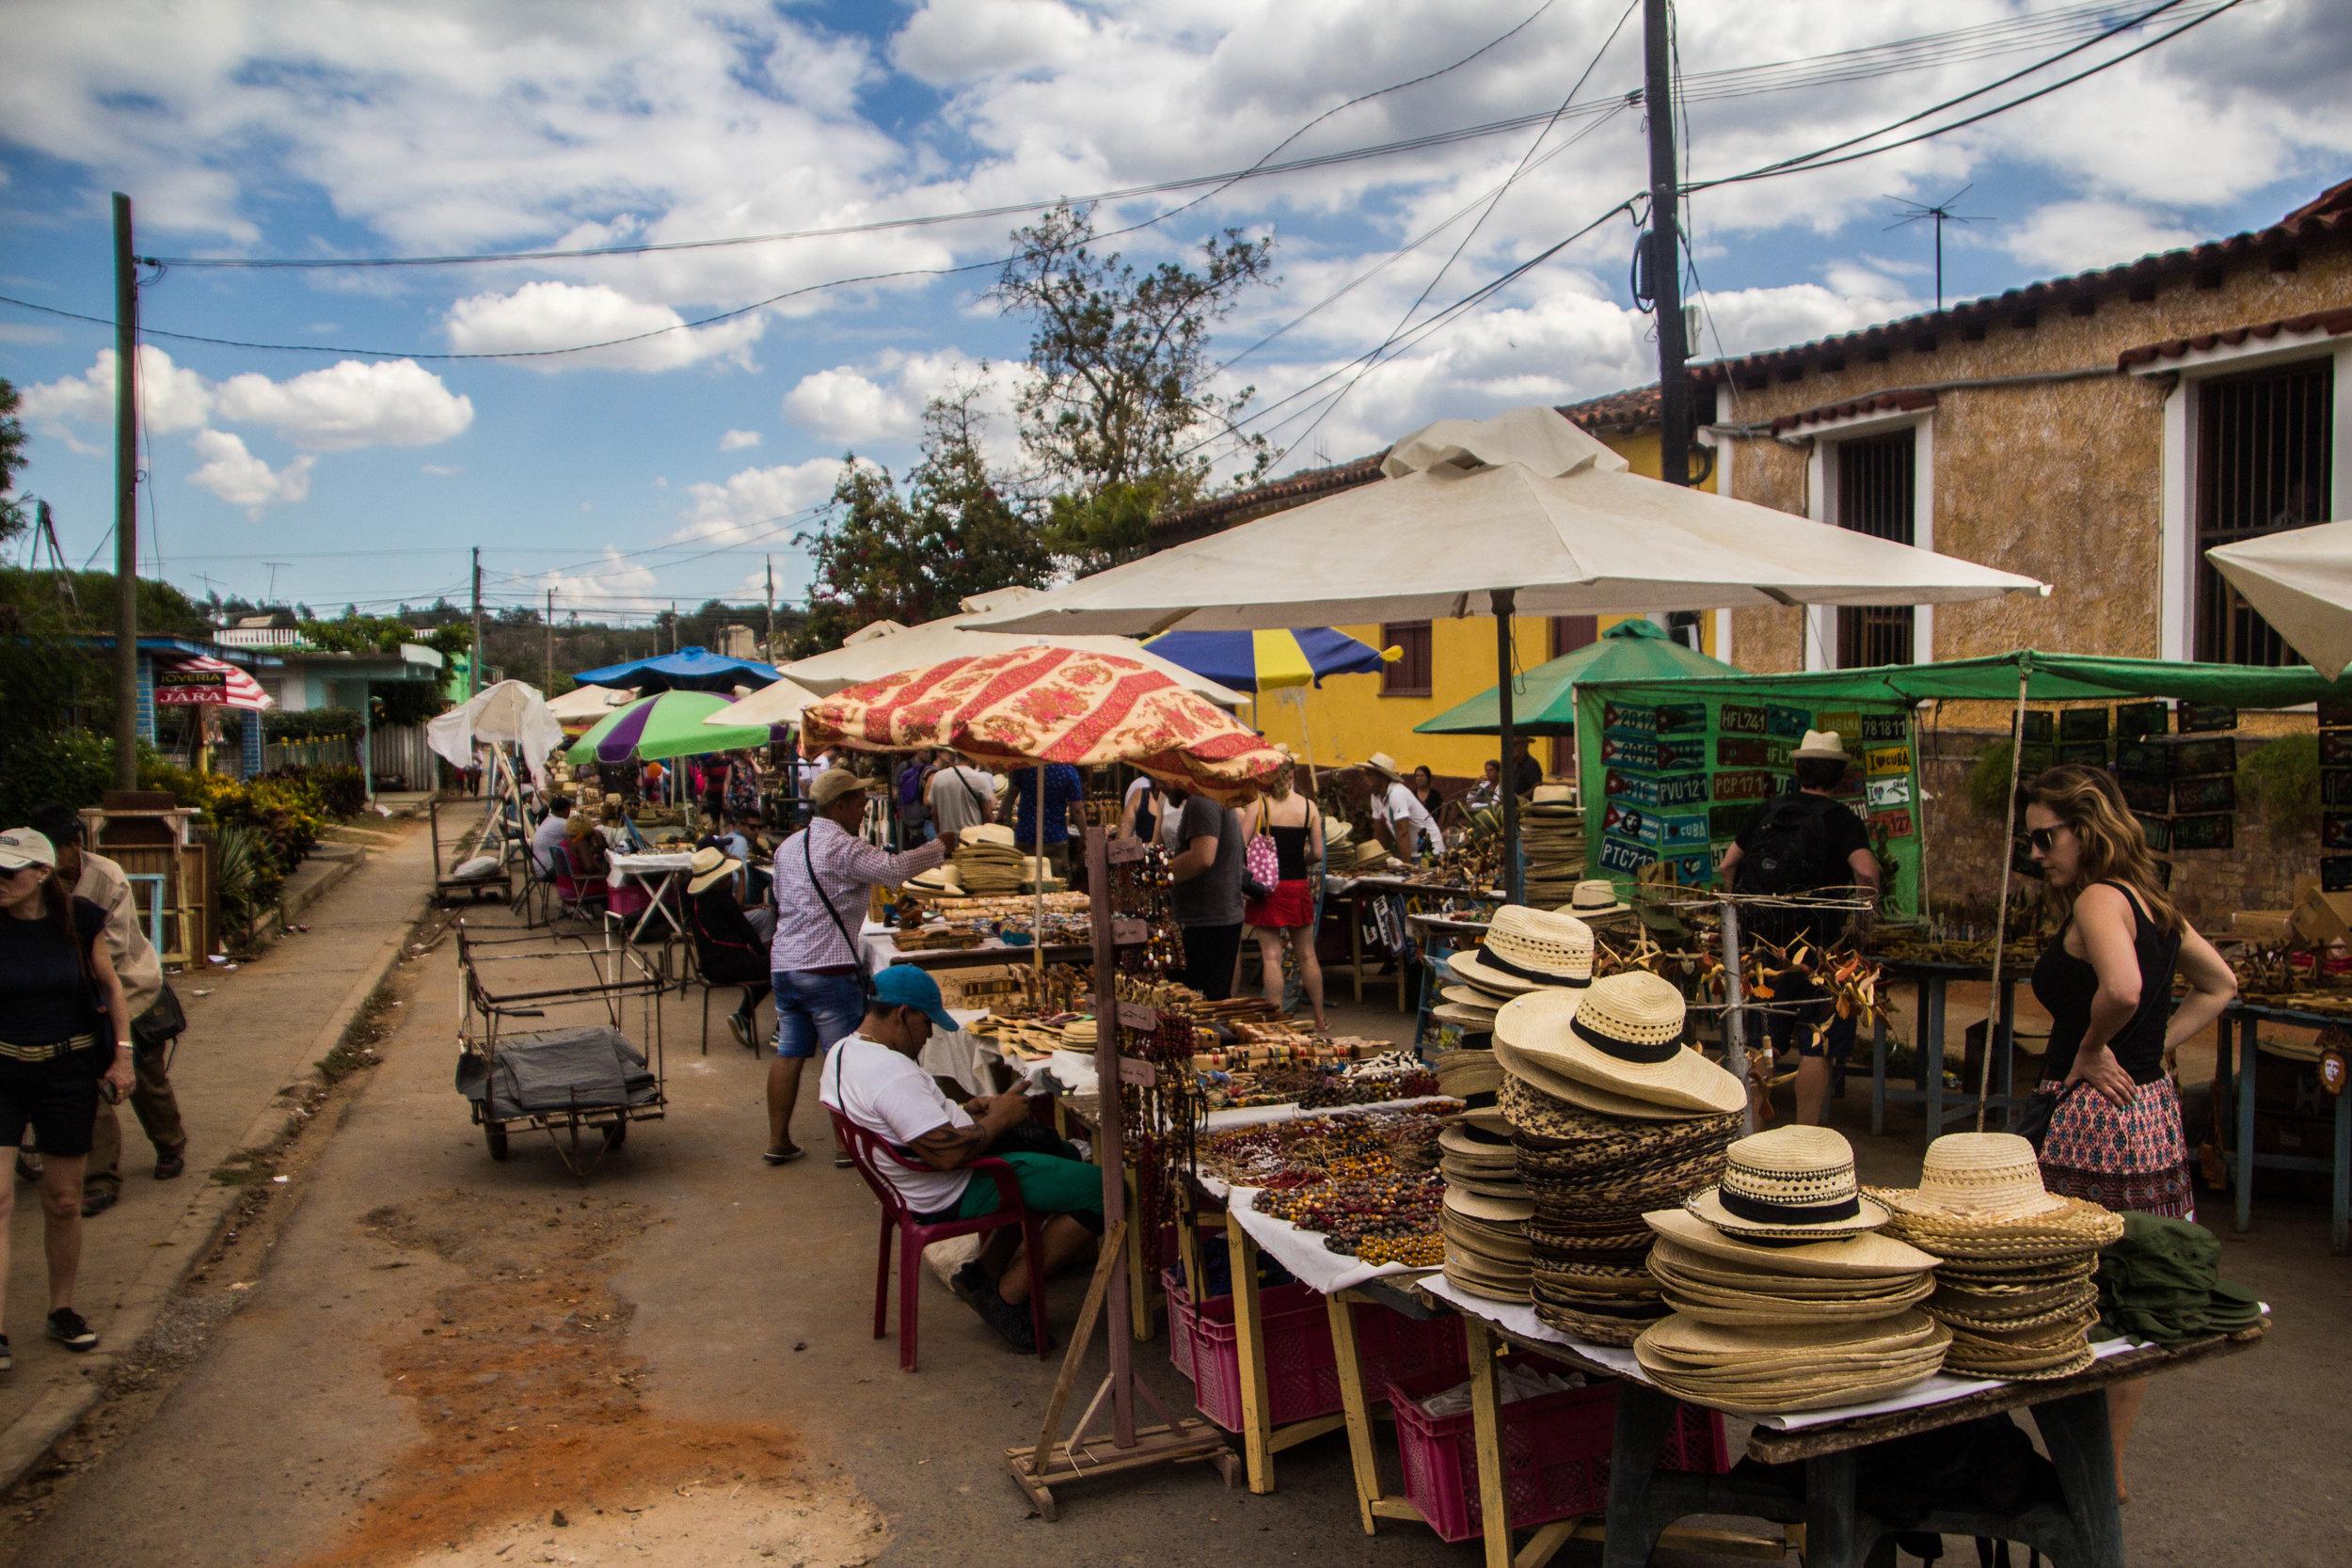 tourist market viñales town cuba-1-3.jpg